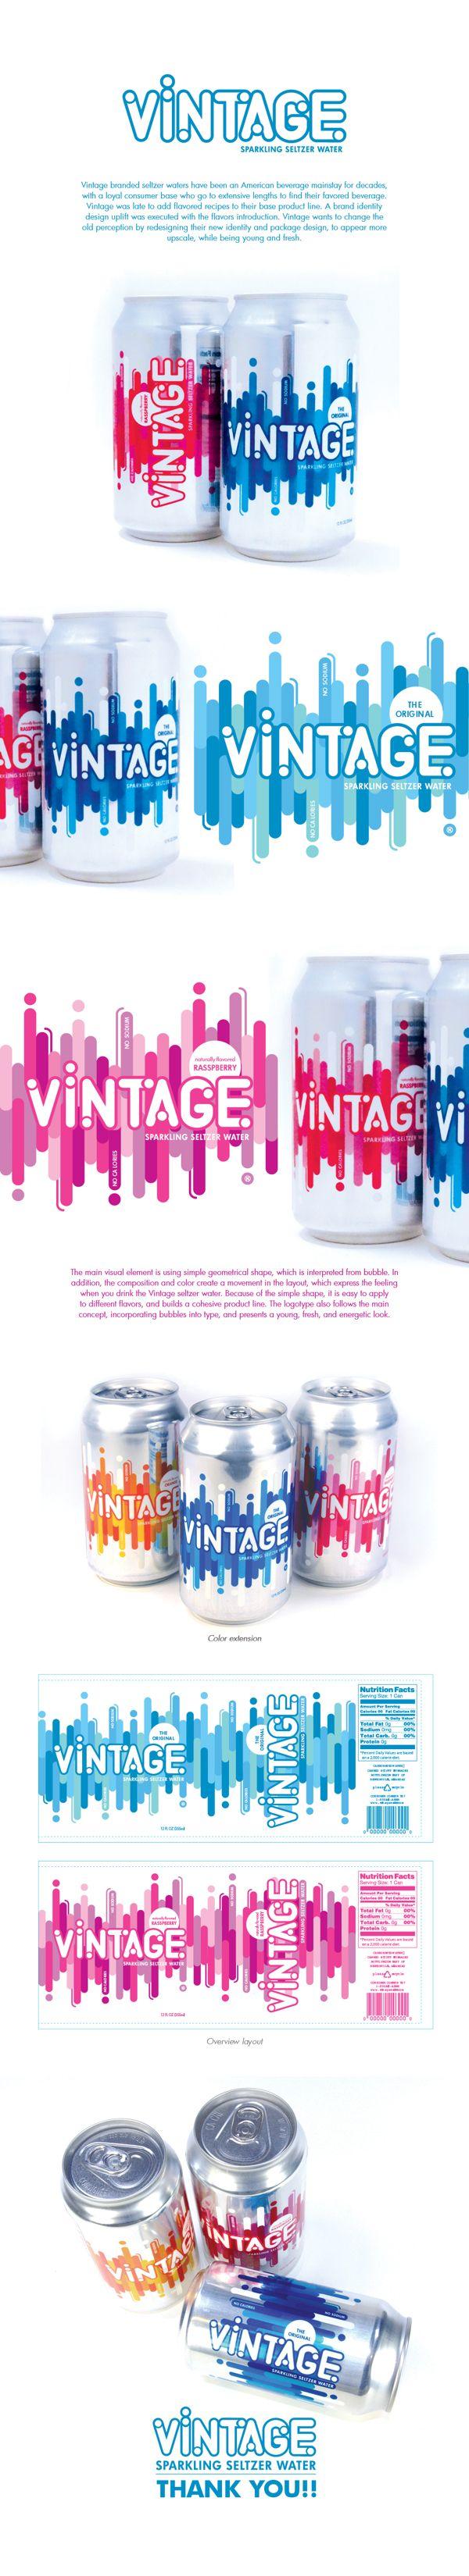 Vintage Seltzer Water Rebranding by CHENGWEN fung, via Behance PD